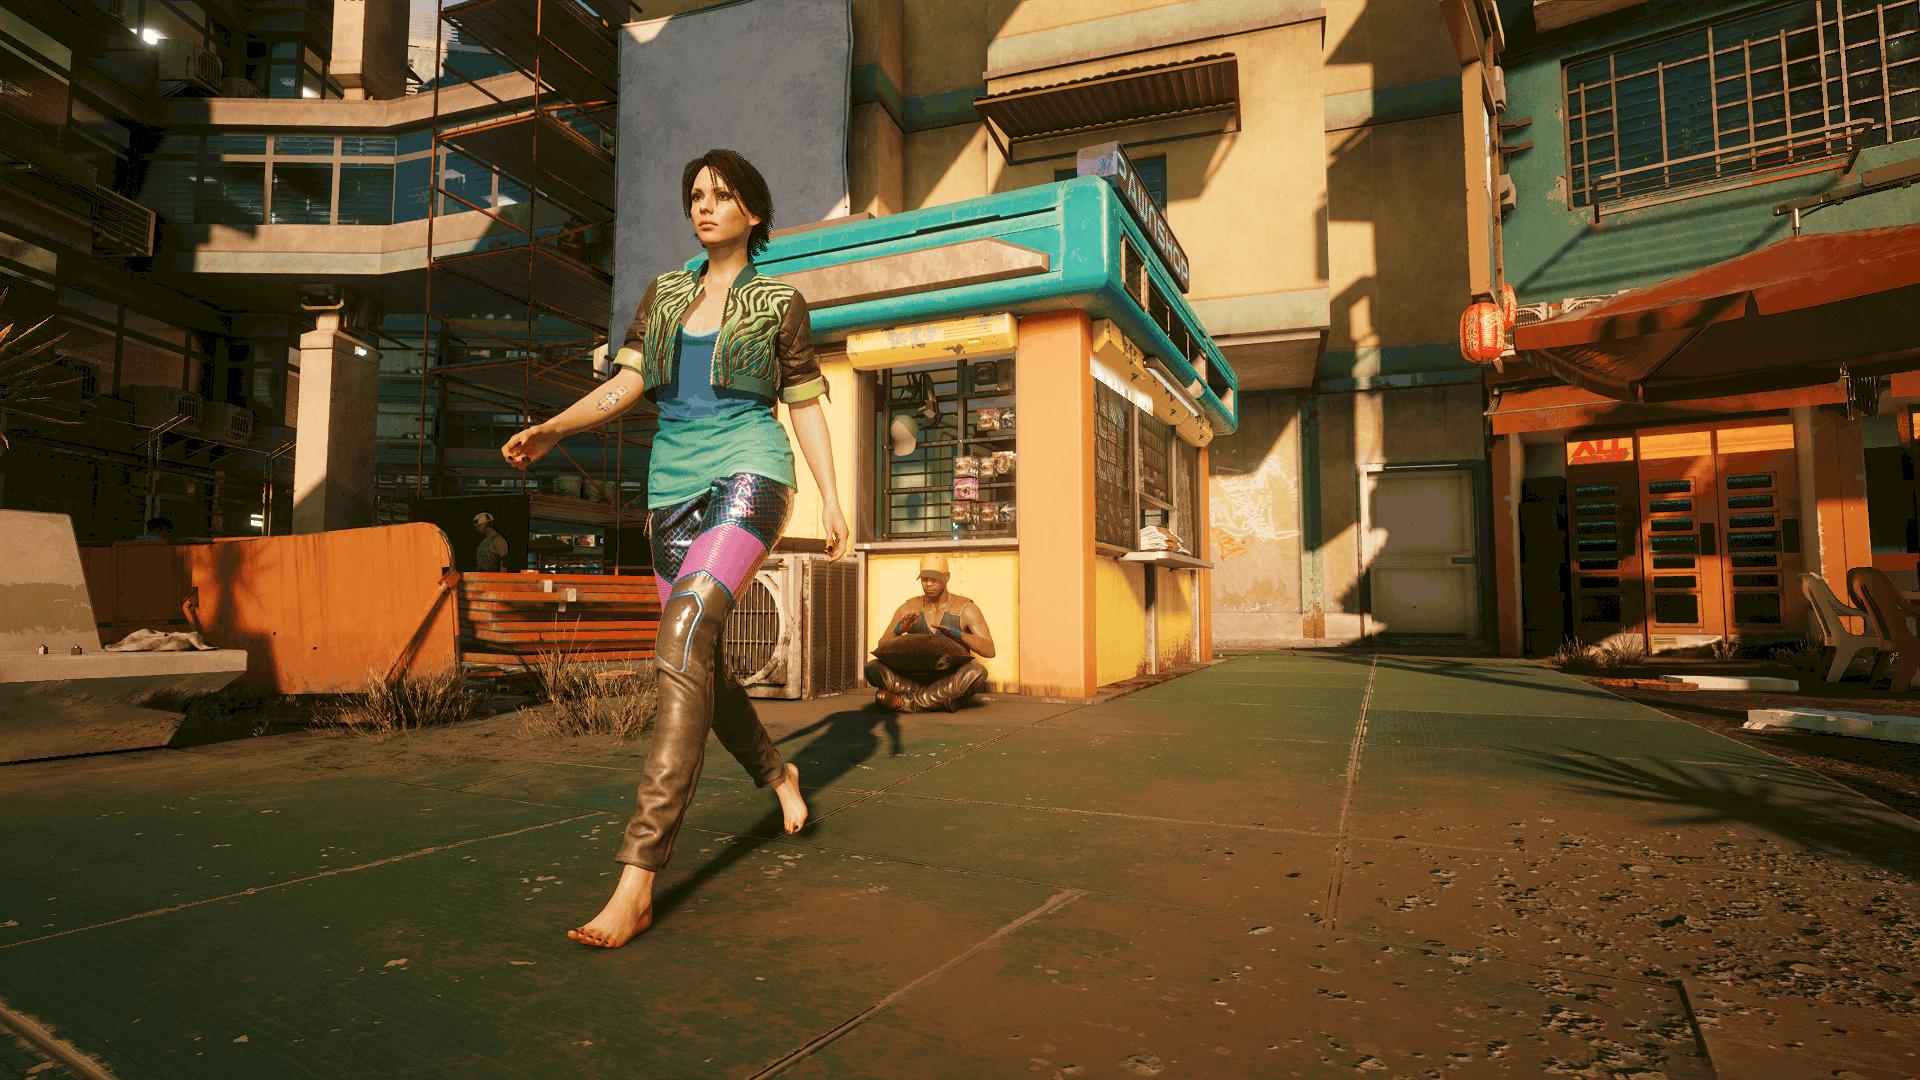 Female Vs Less Ugly Feet - Cyberpunk 2077 Mod